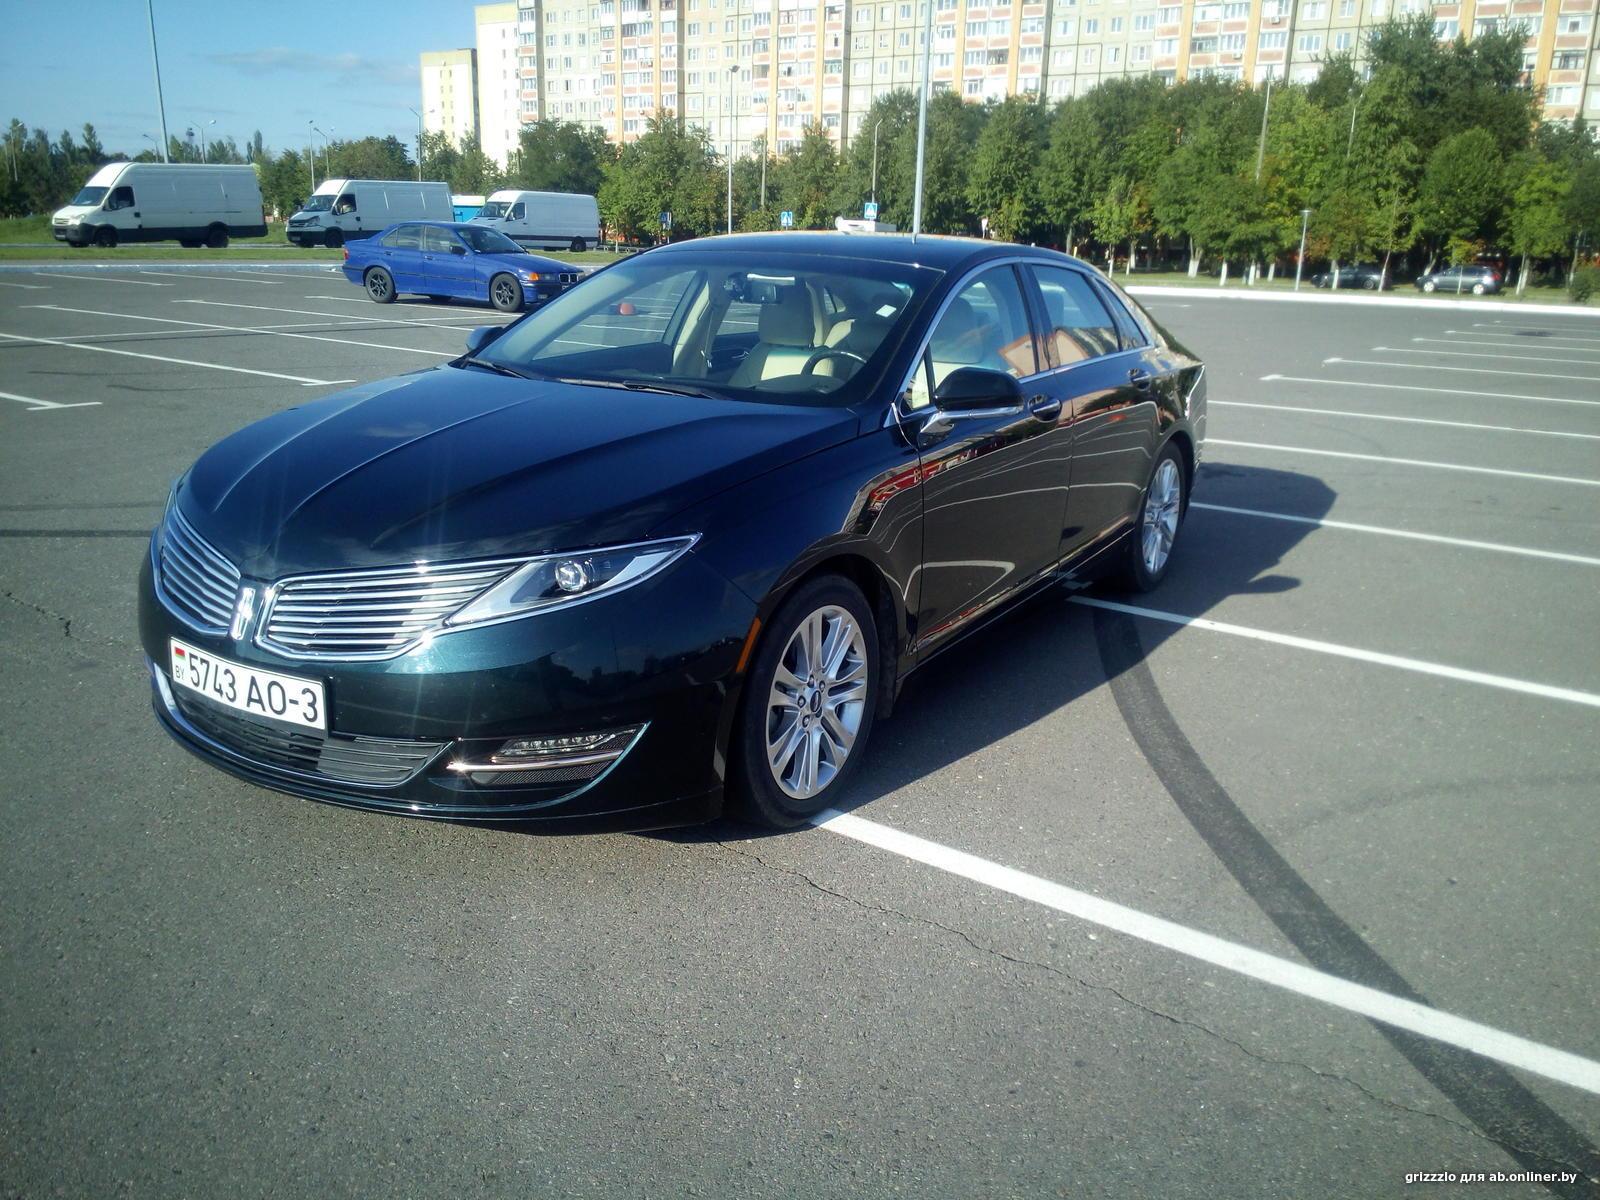 Lincoln MKZ HYBRYD